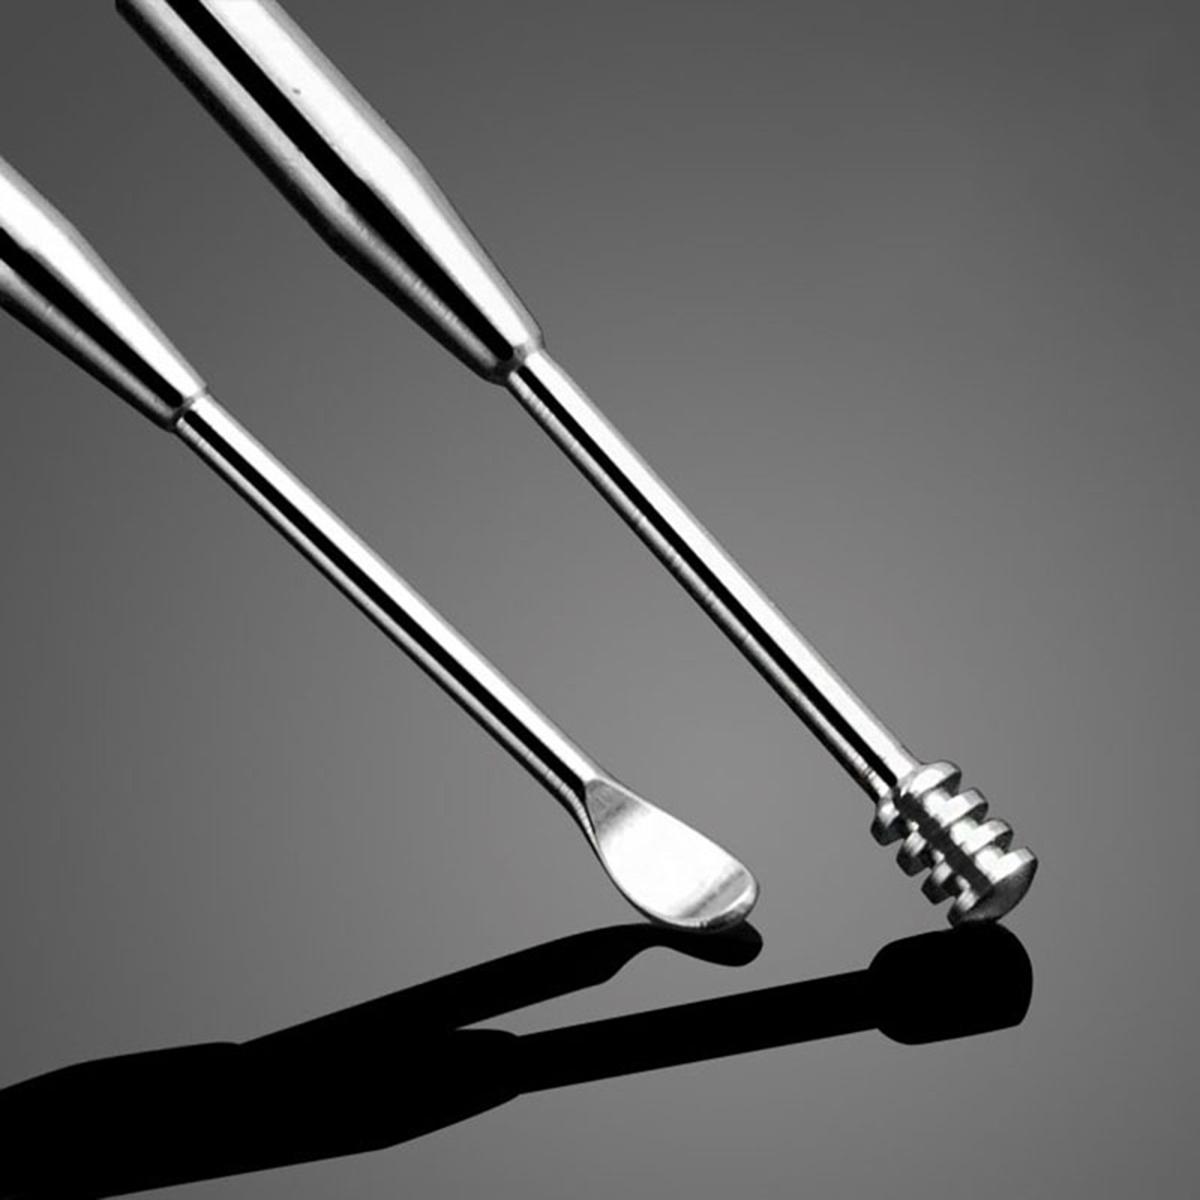 3pcs Spiral Silver Ear Wax Removal Earpick Cleaner Kit ... Ear Wax Removal Tool